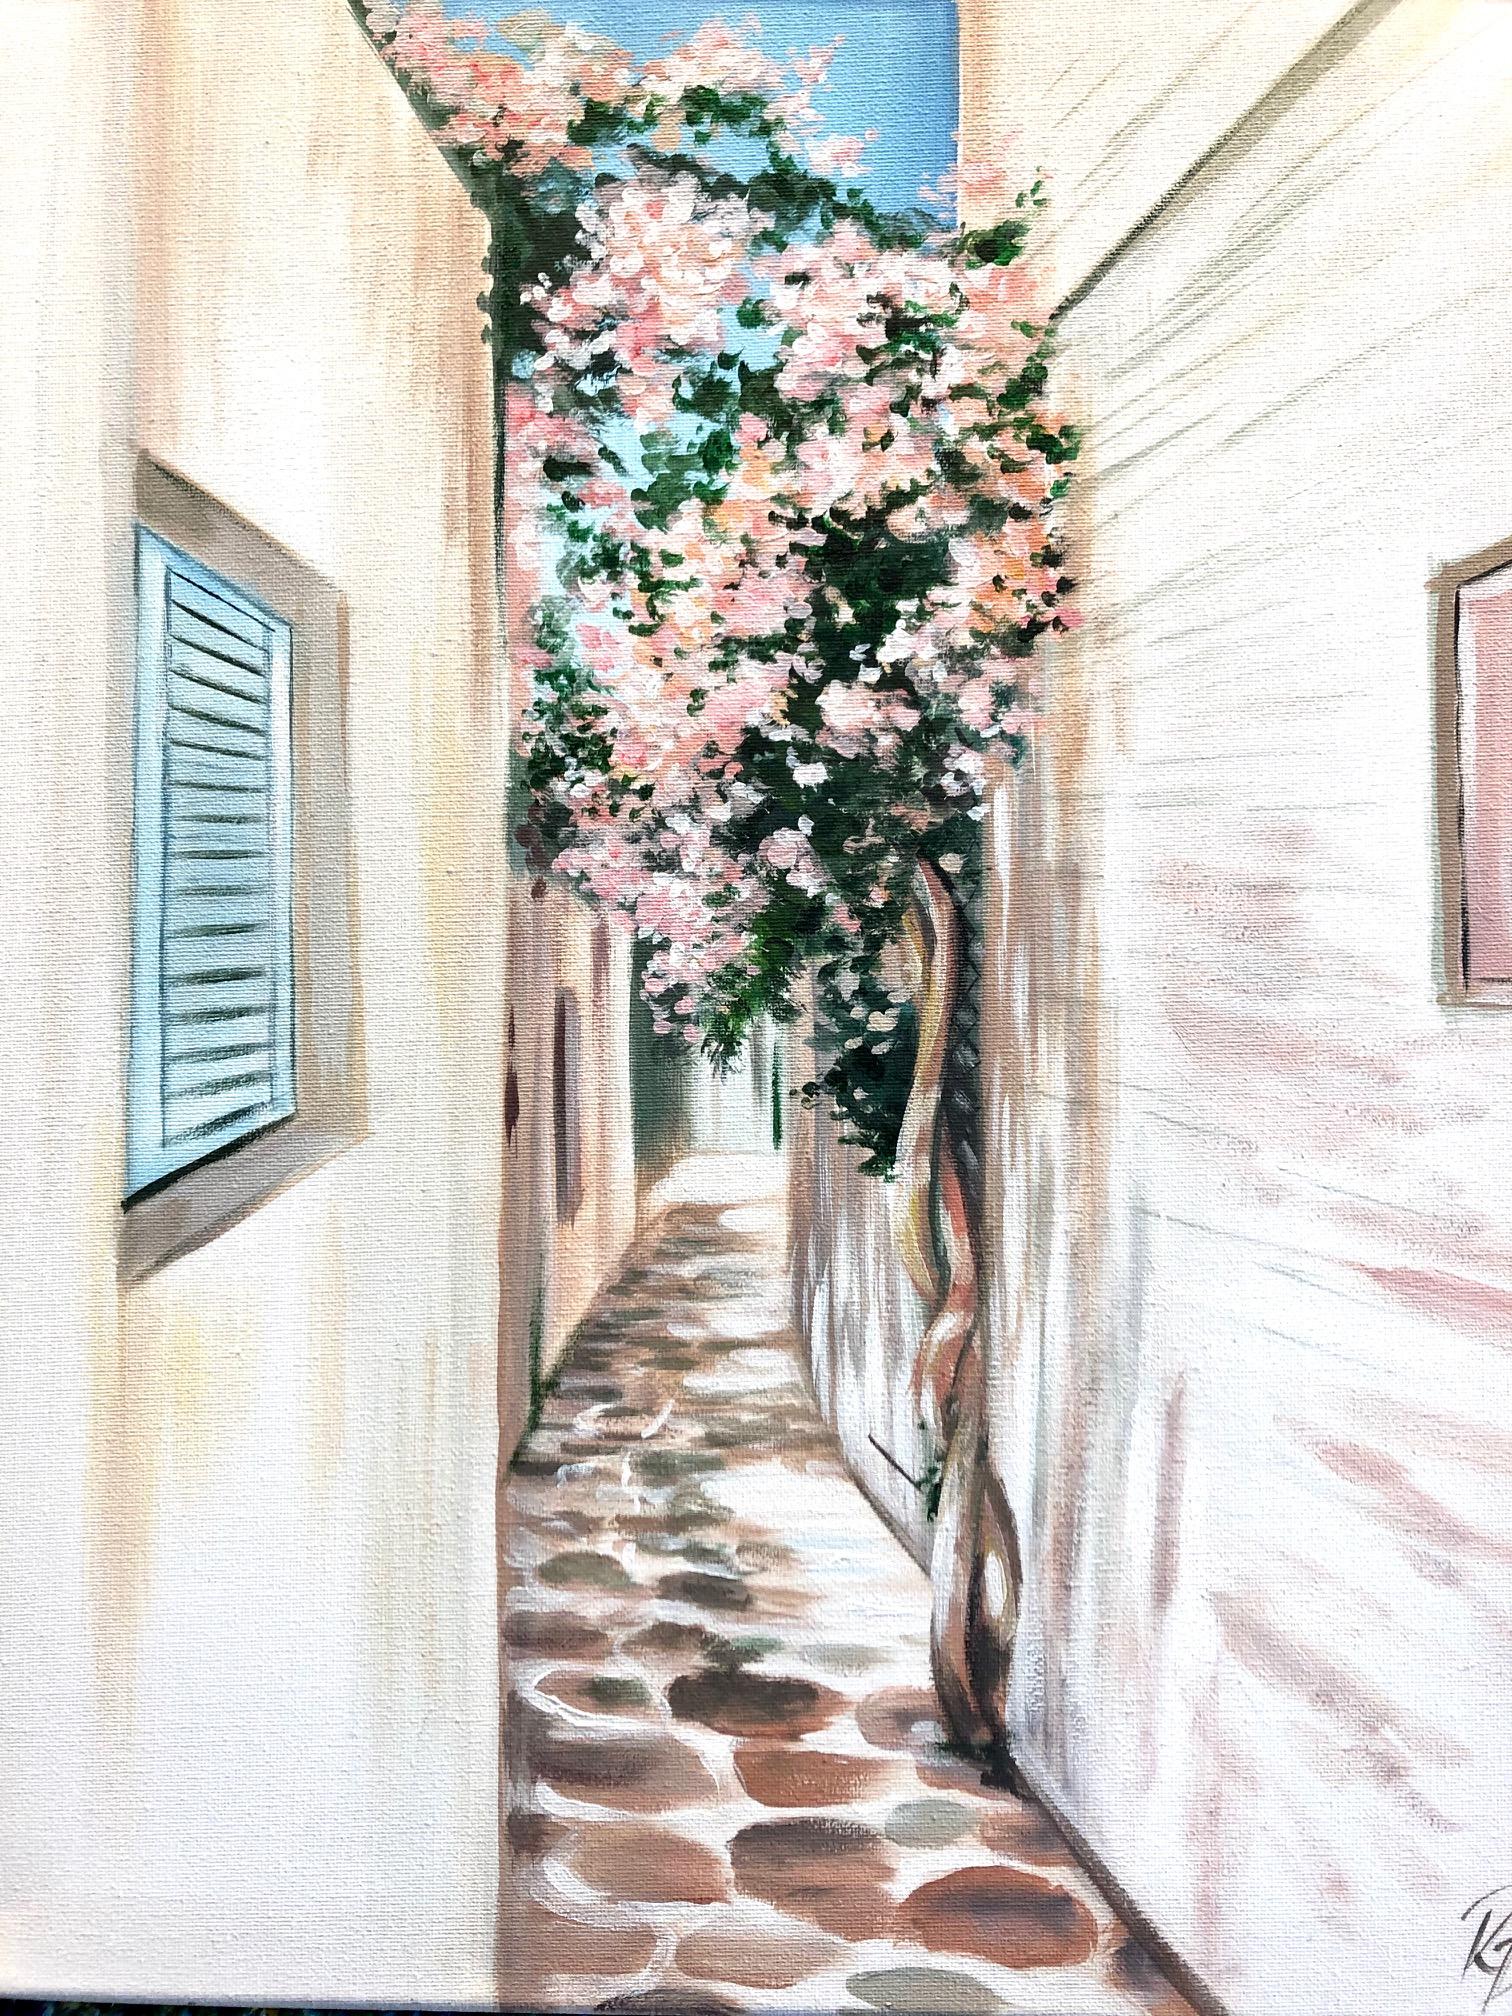 FessNeki: Via dell'amore